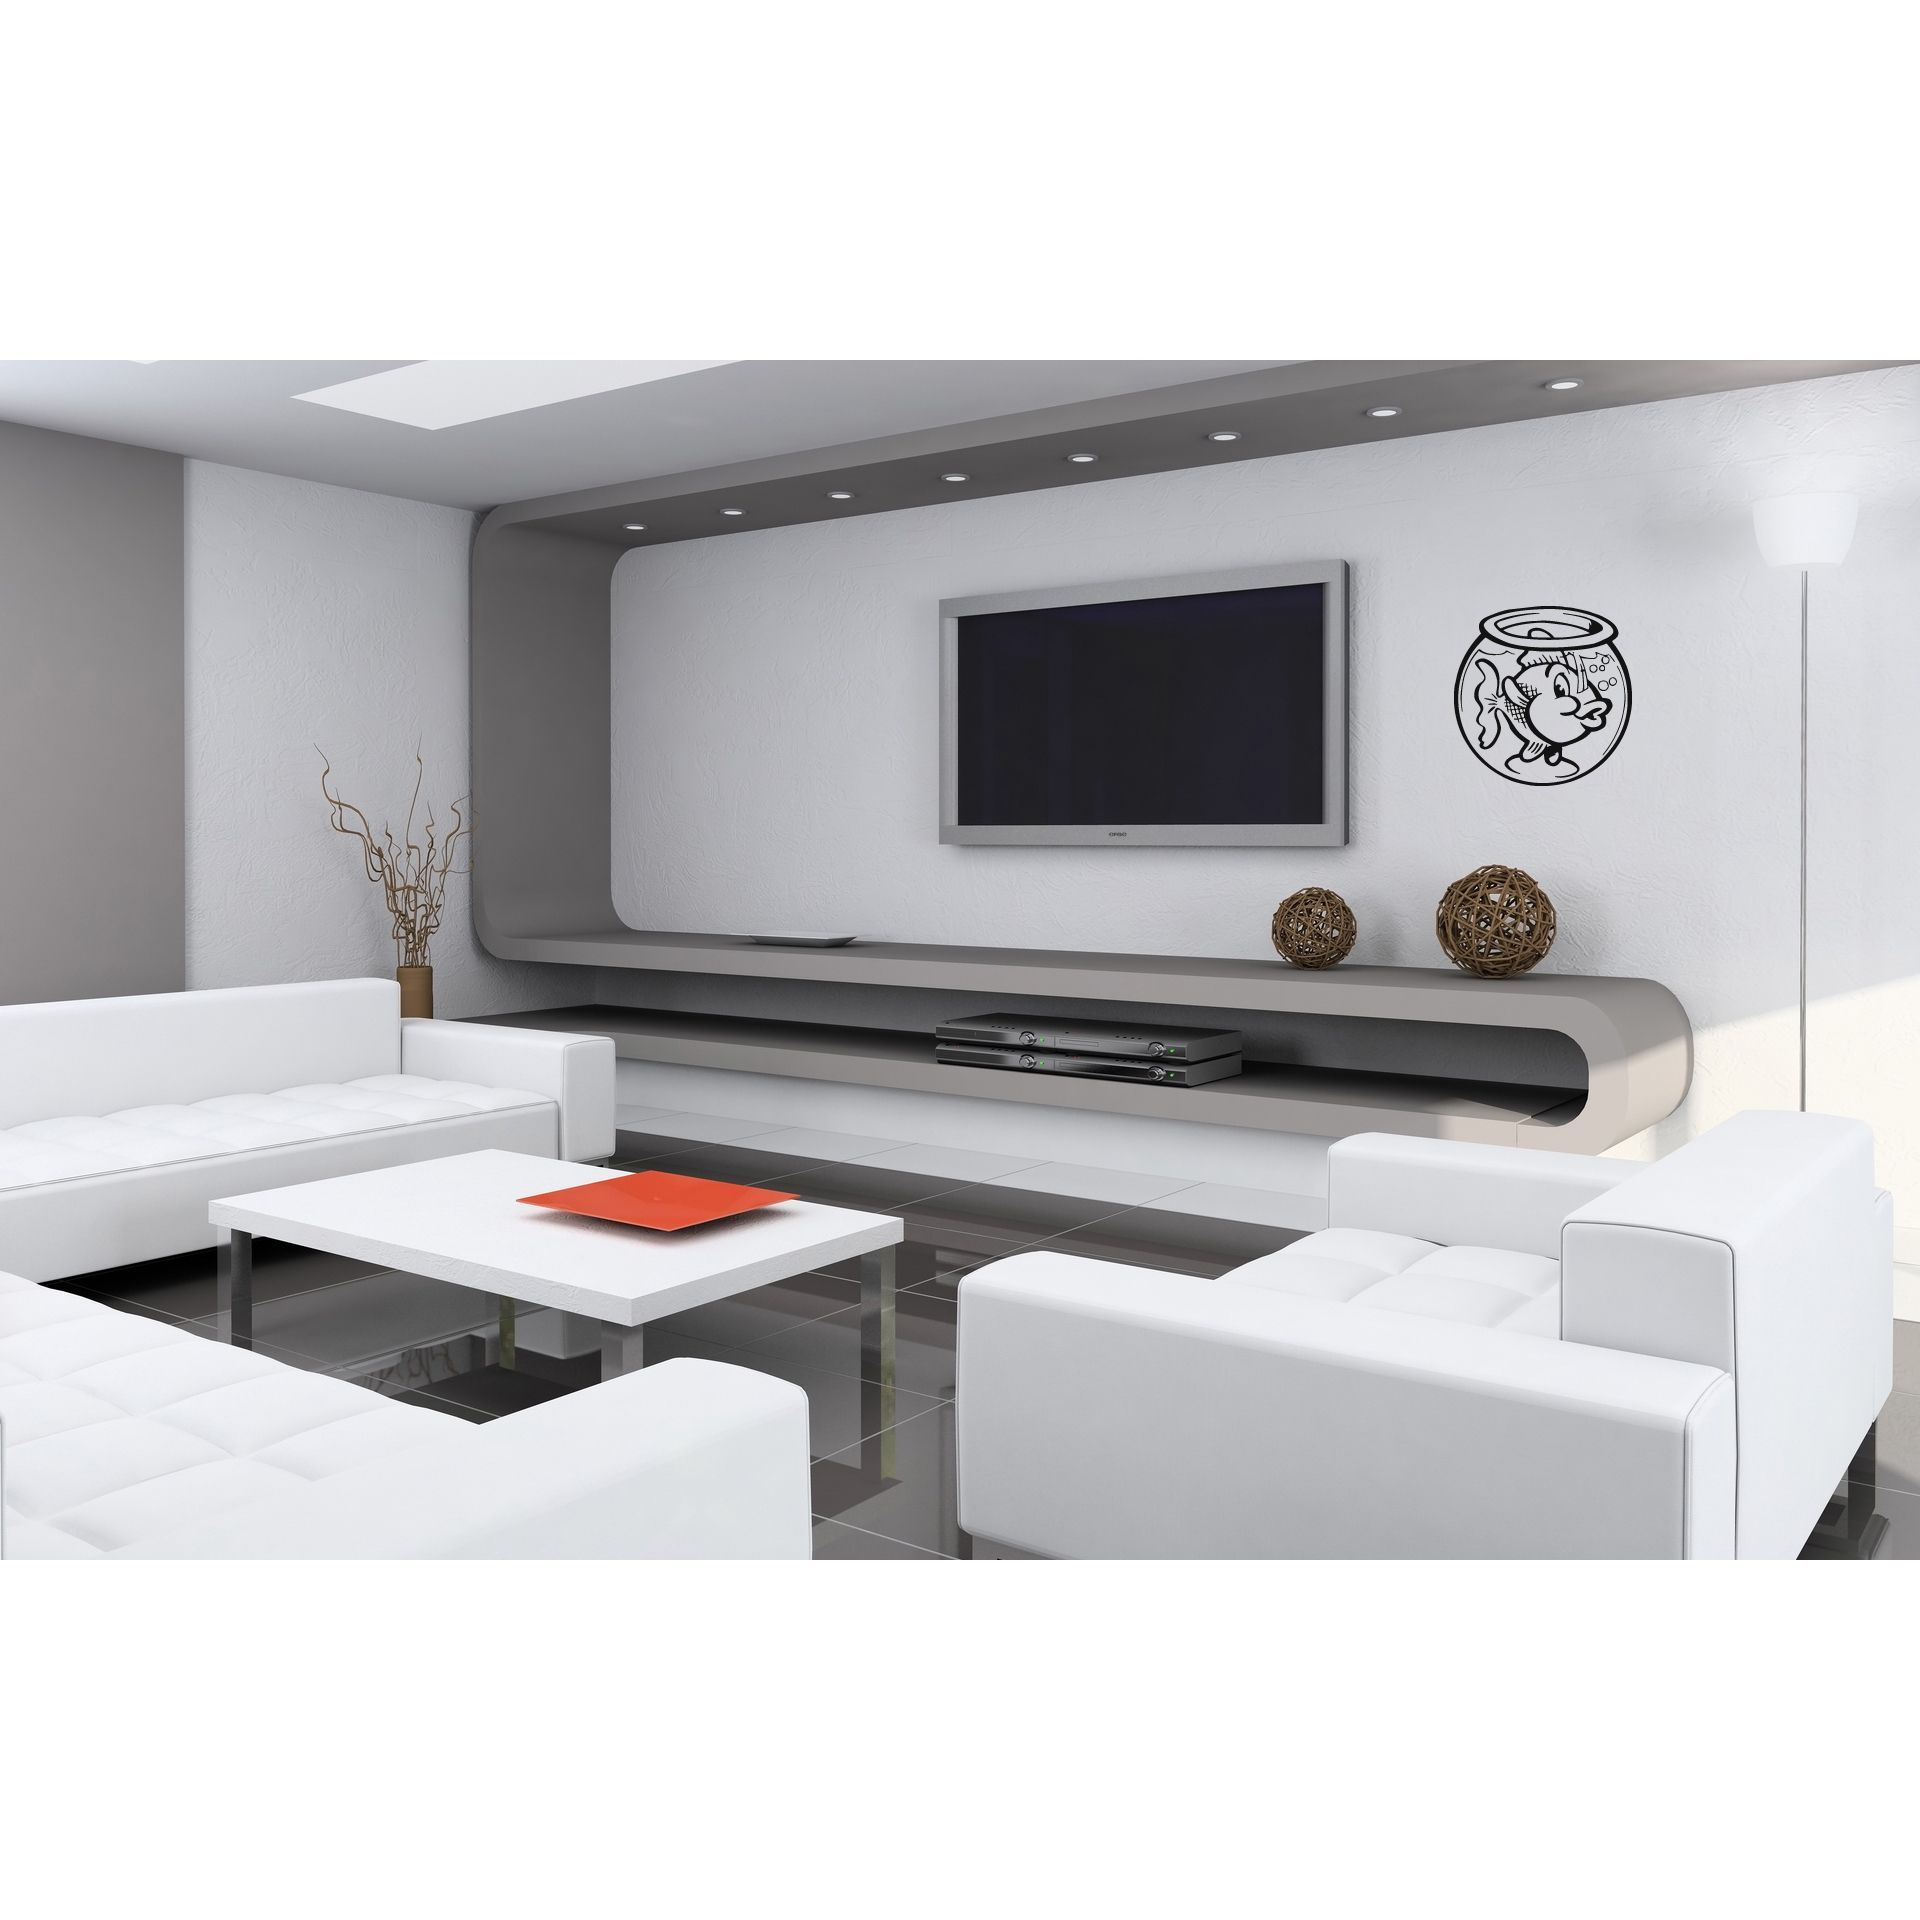 Minimalist Living Room Ideas Choosing Living Room Decorating Room Design  Interior Design Design Ideas Designs